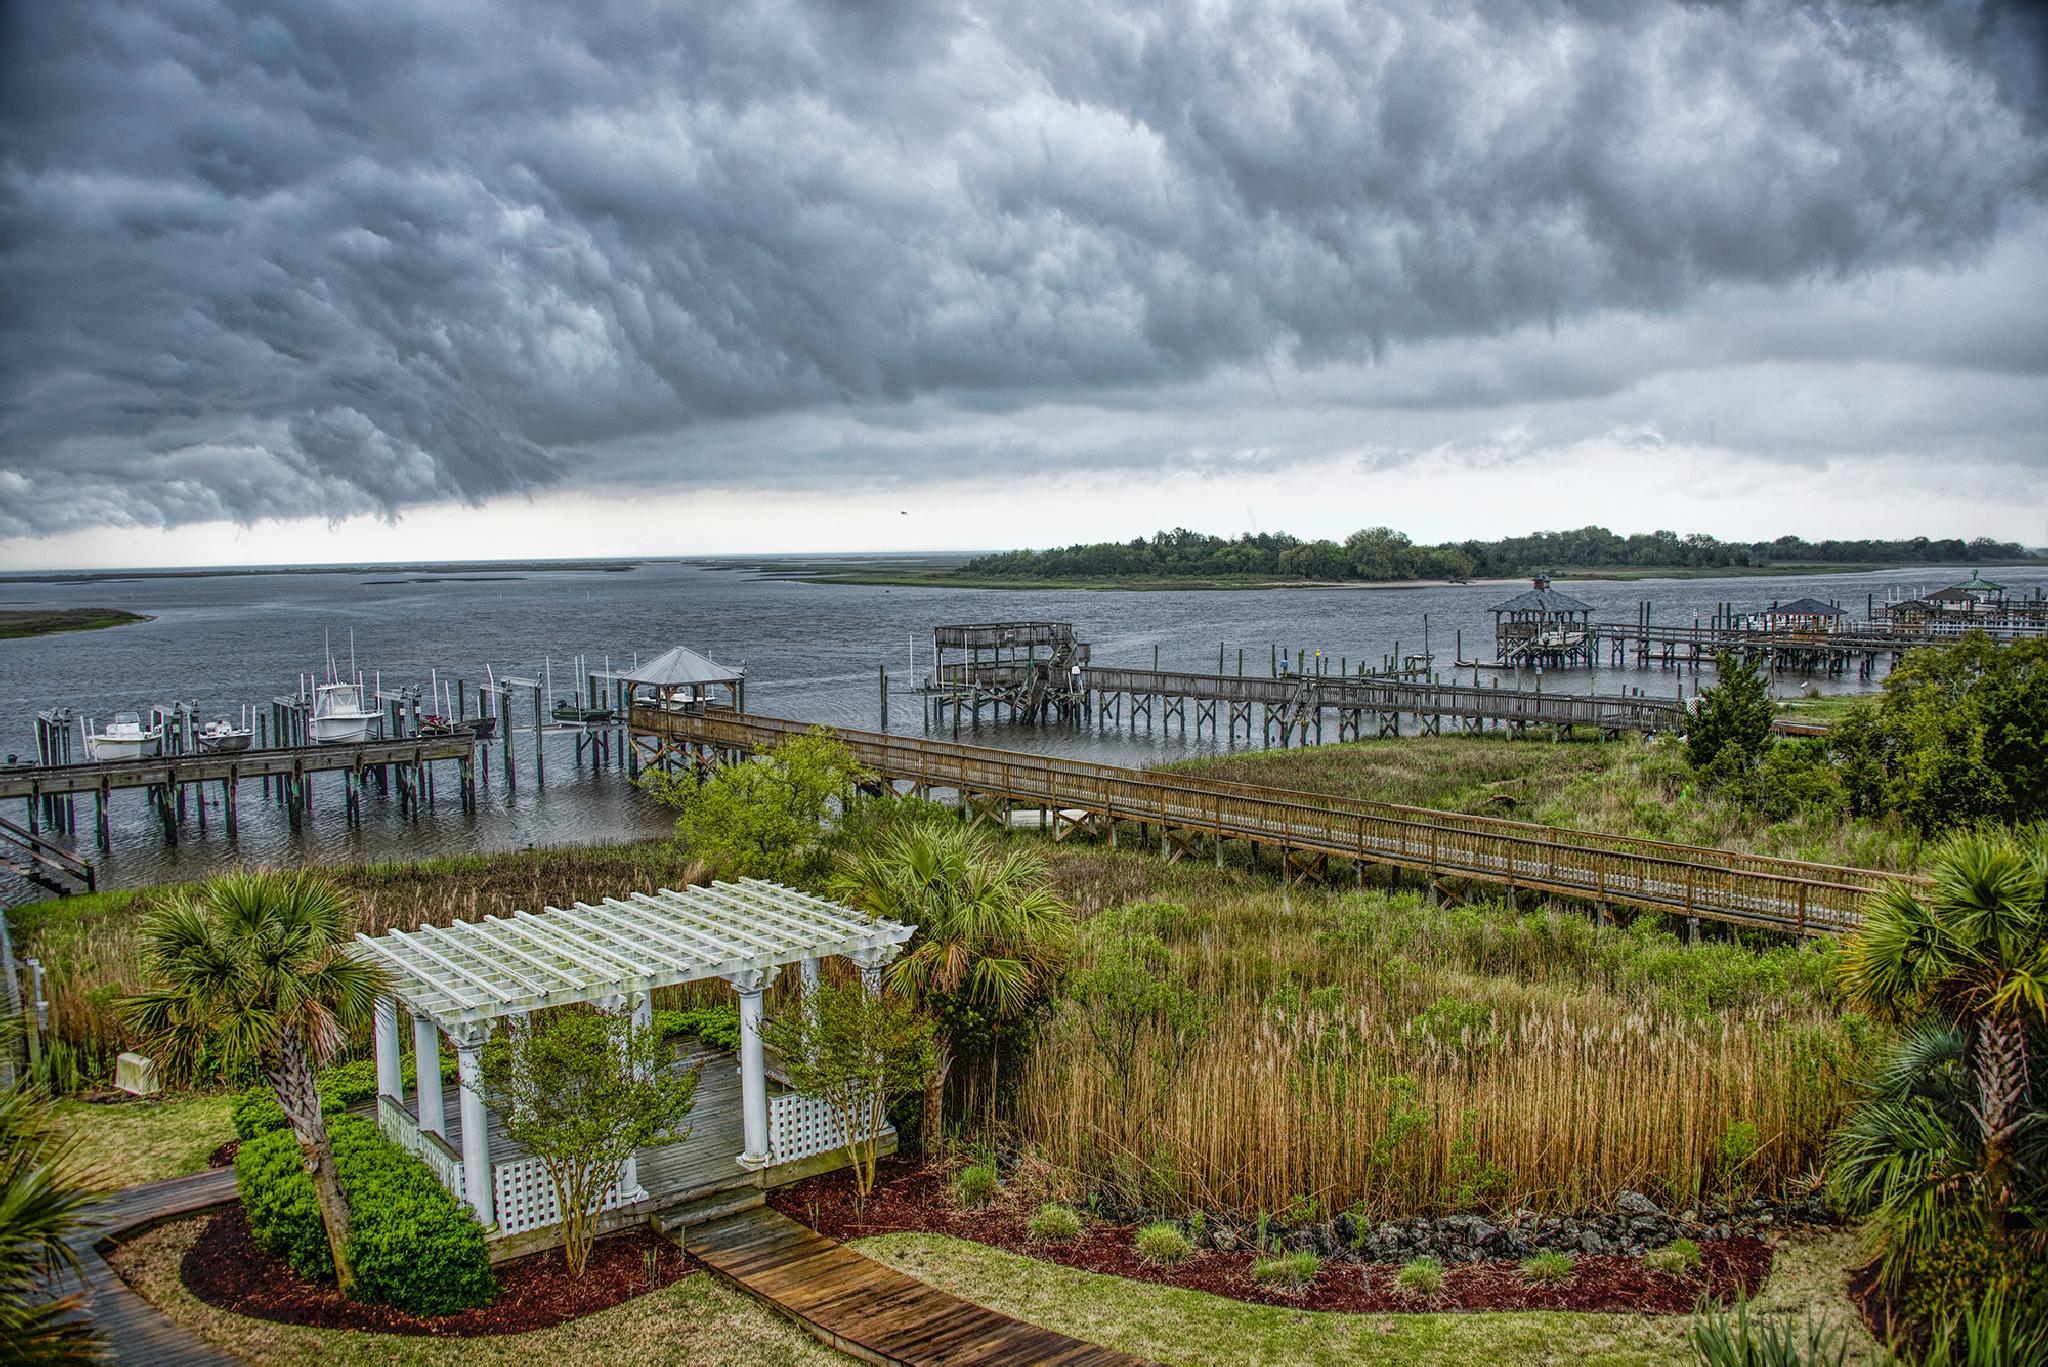 Storm passing over Intercoastal Waterway, Wilmington NC by tedurquhart1